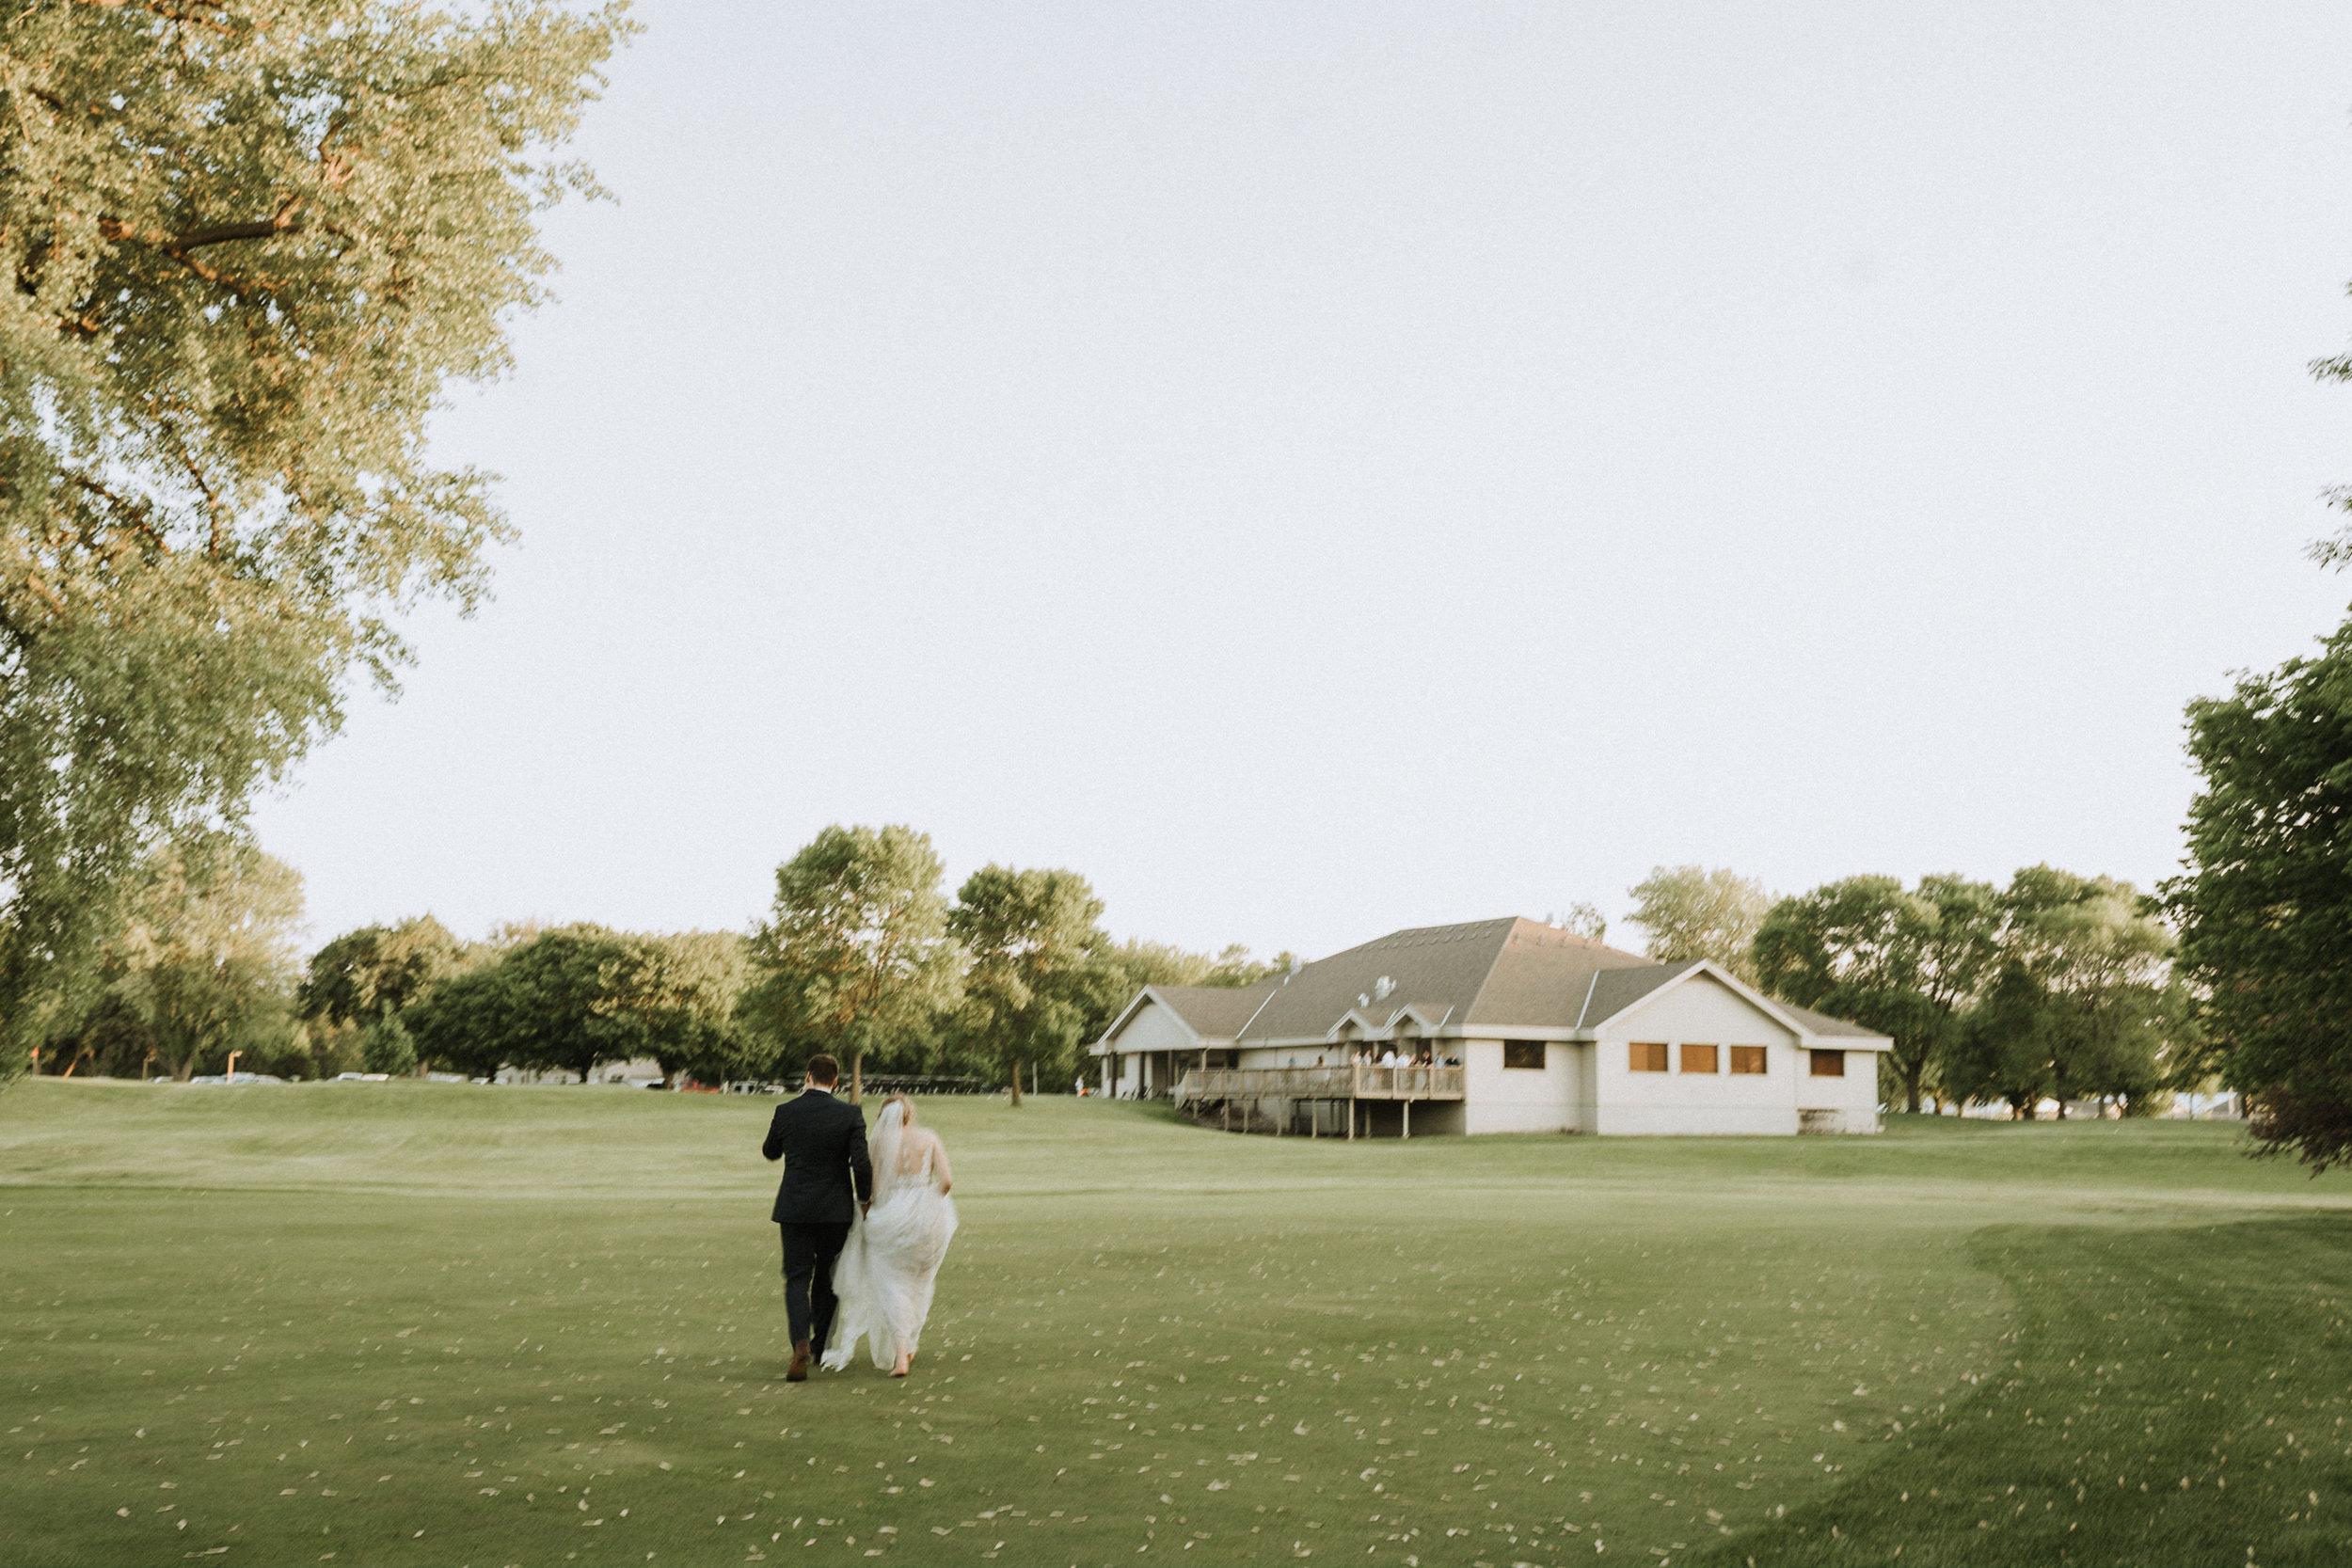 Wedding_(10_of_10).jpg